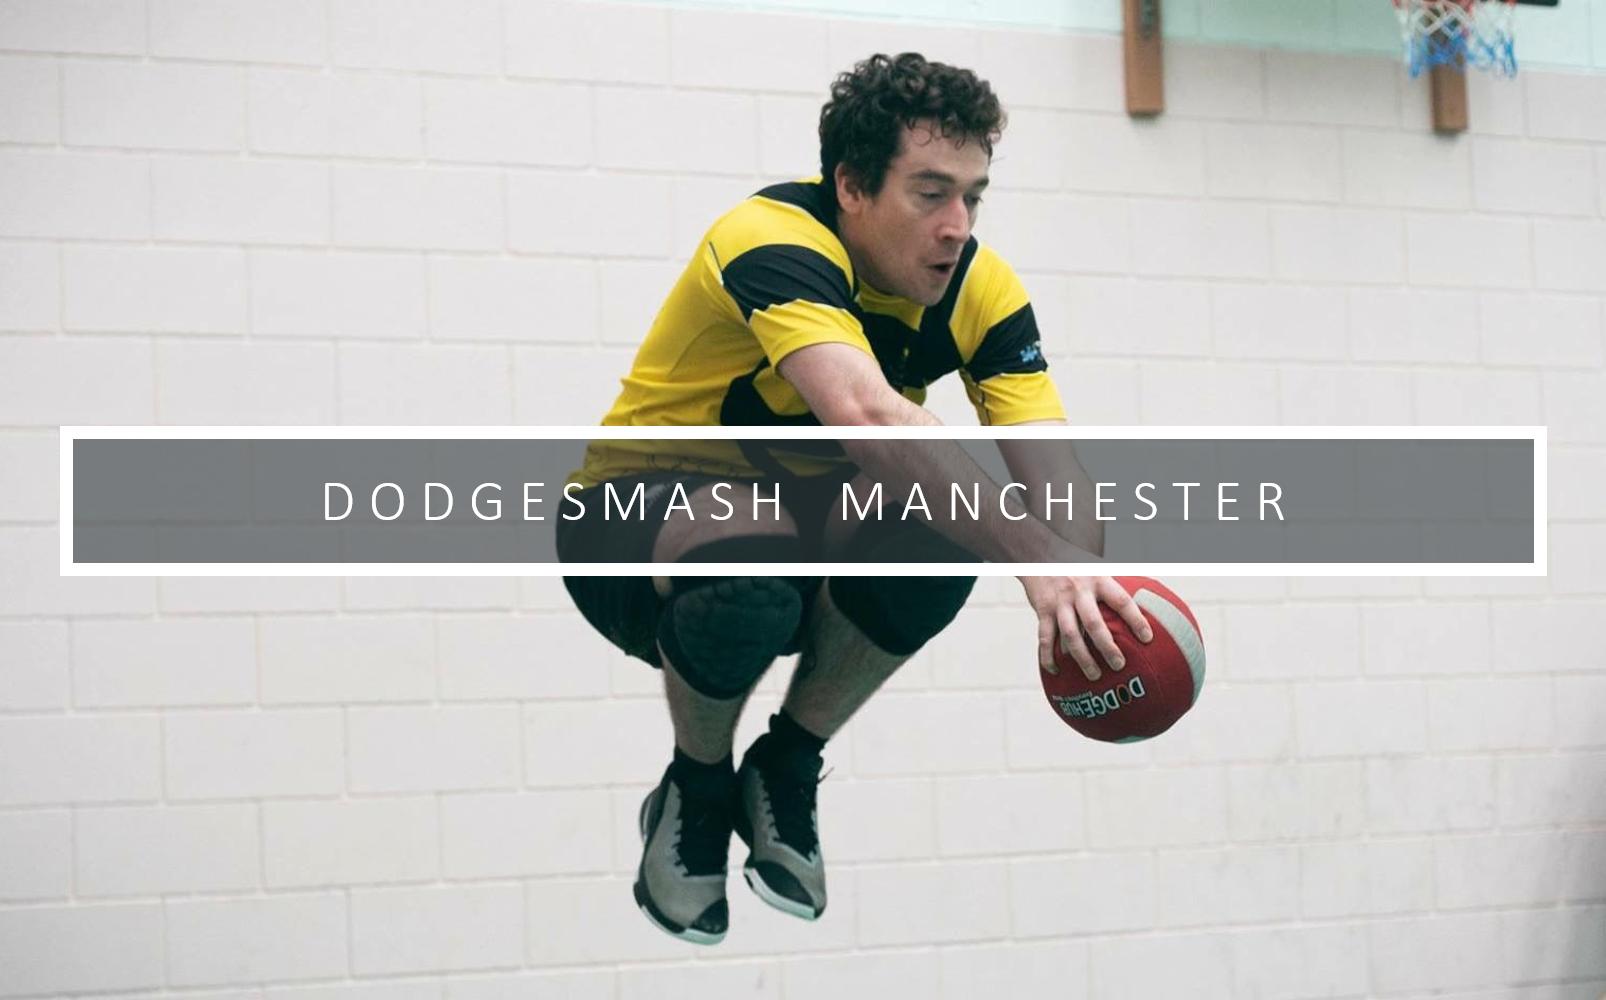 DodgeSmash Manchester